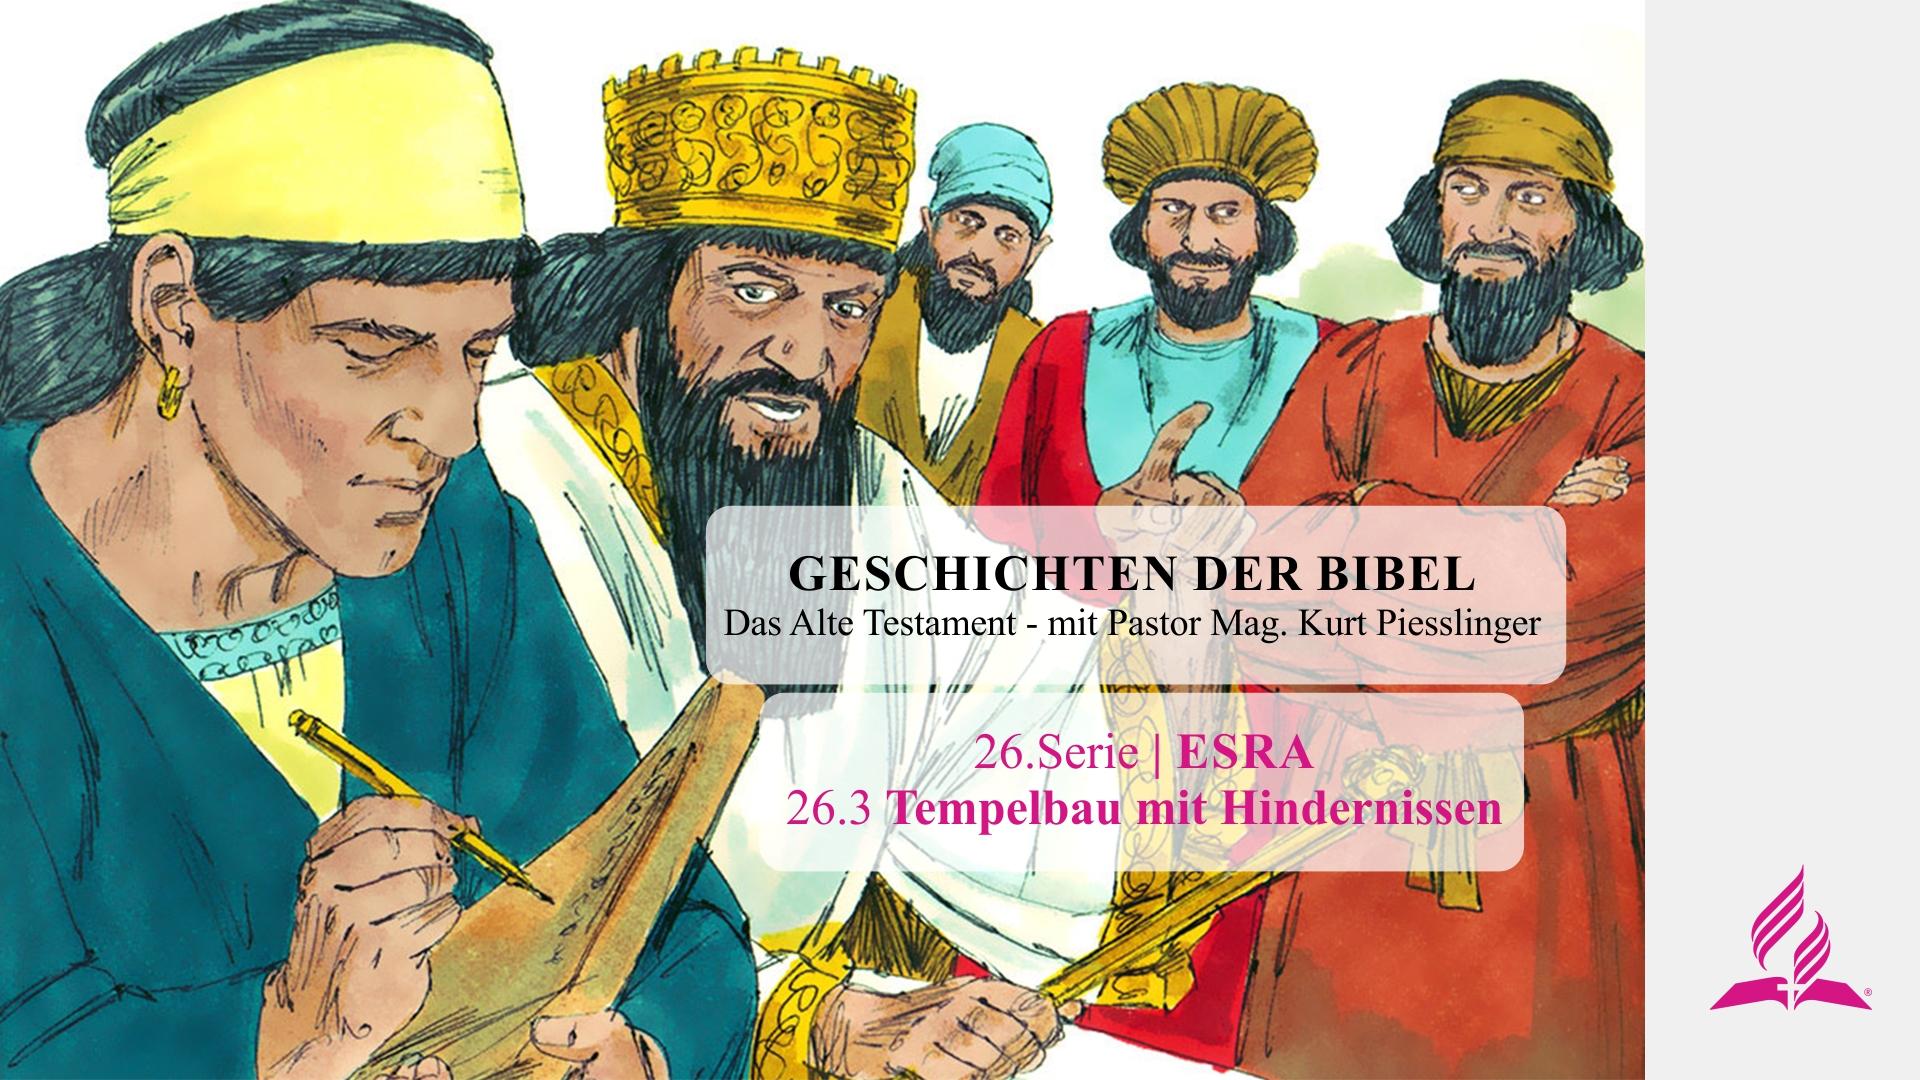 GESCHICHTEN DER BIBEL: 26.3 Tempelbau mit Hindernissen – 26.ESRA | Pastor Mag. Kurt Piesslinger